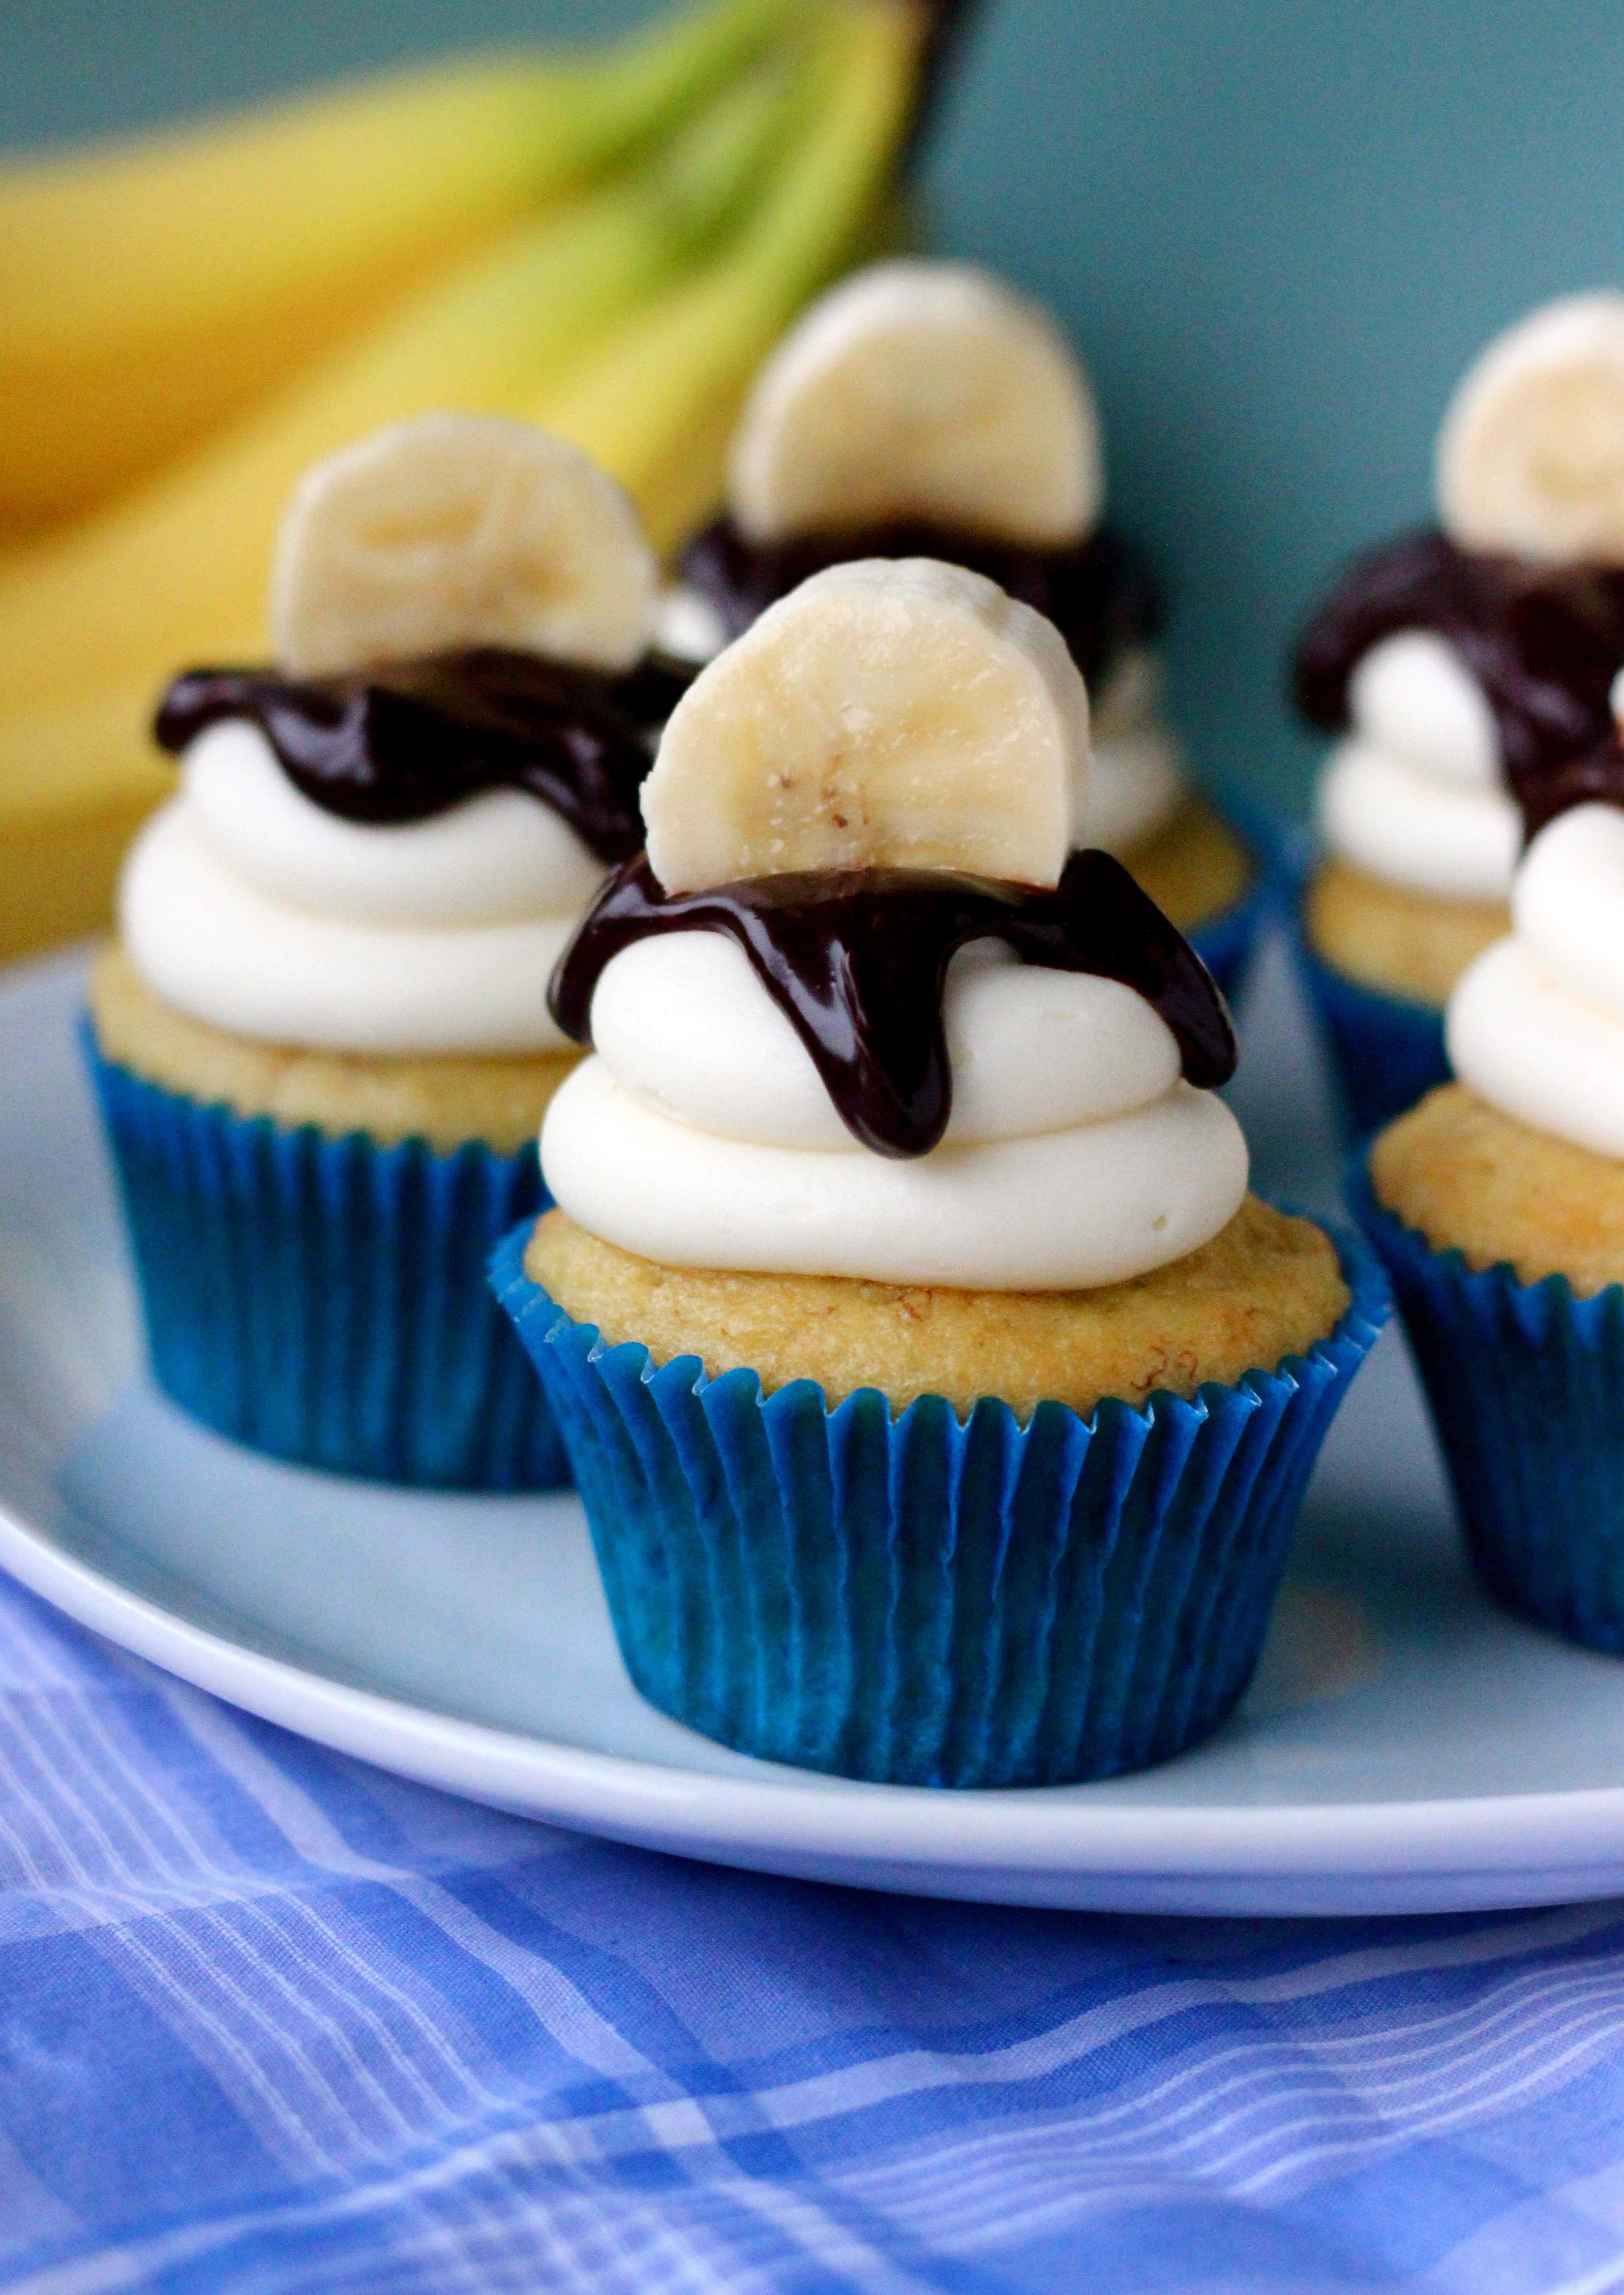 Easy Chocolate Banana Cake With Oil